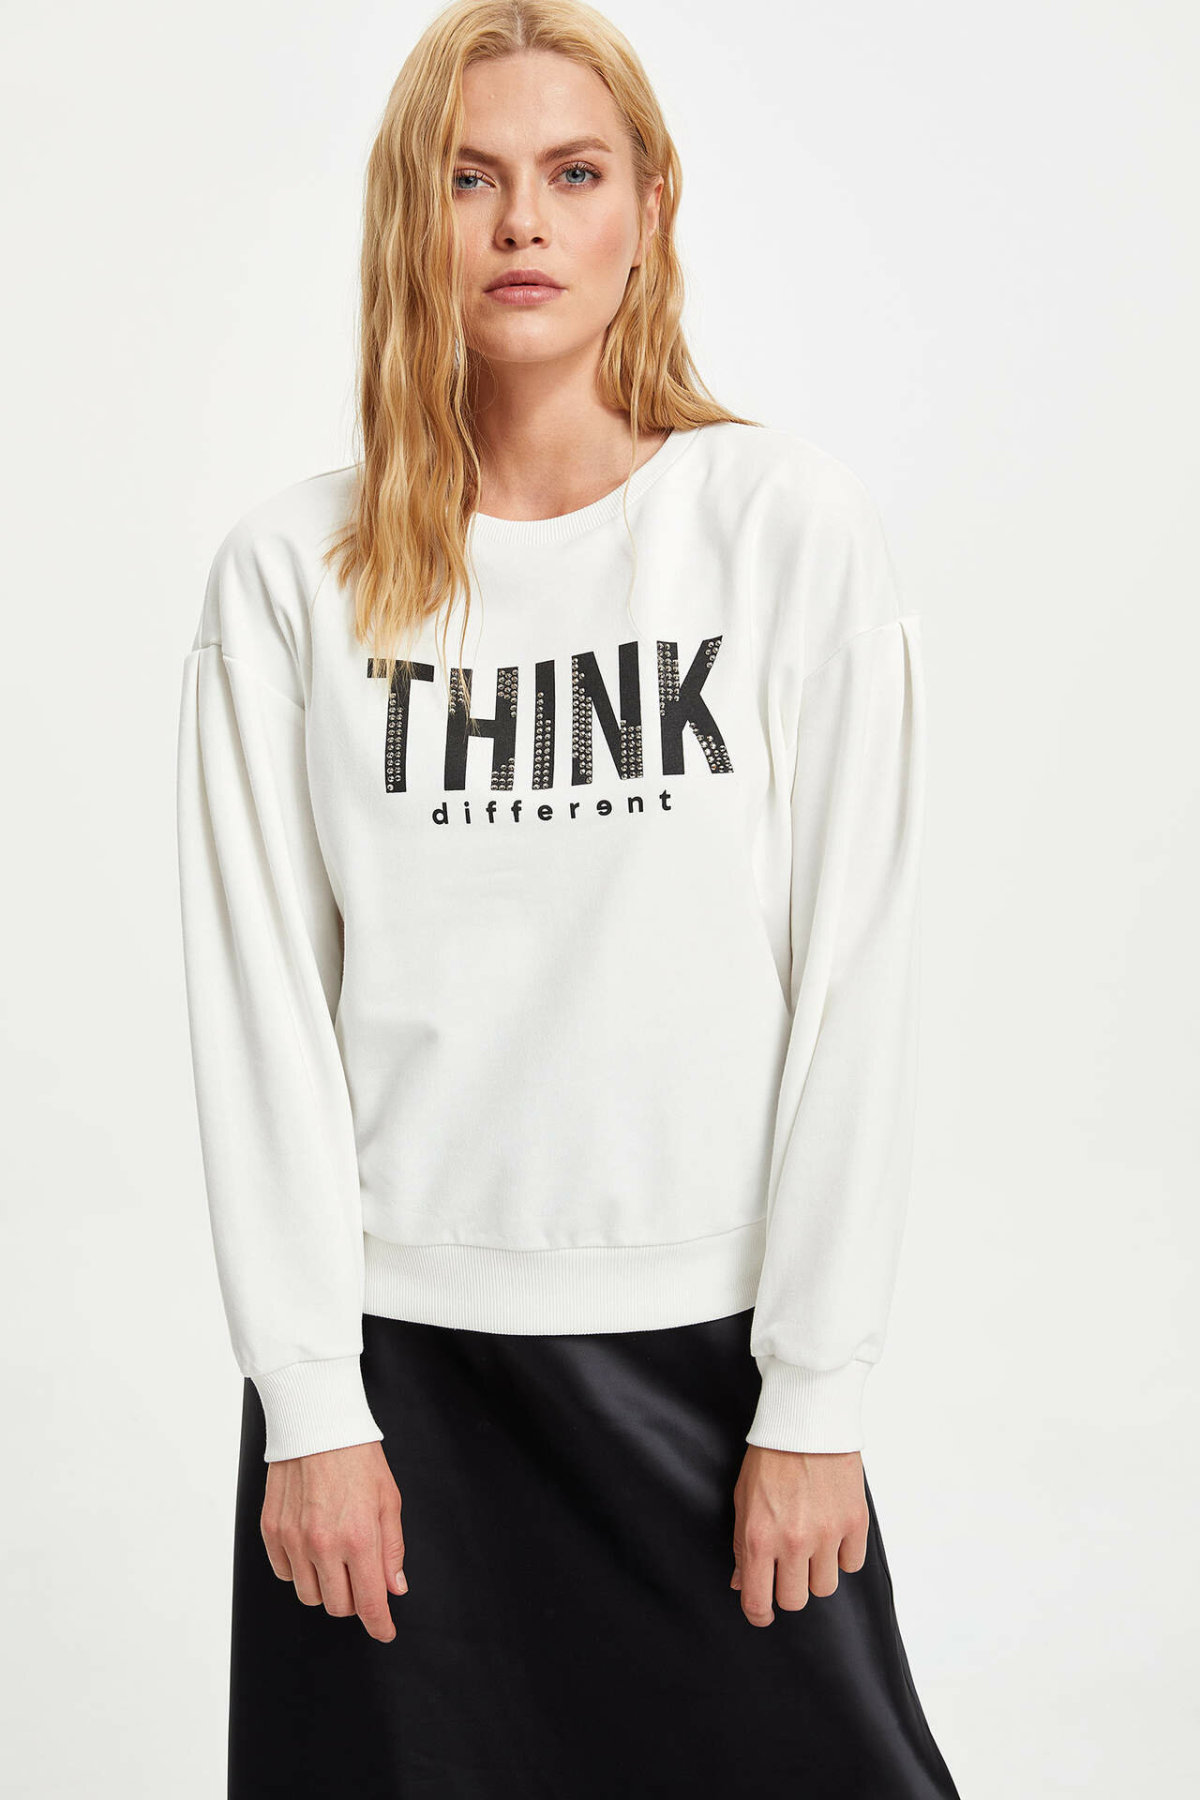 DeFacto Woman Fashion Crewneck Sweat Shirt Ladies Casual Letter Pattern Long Sleeves Pullovers Female Loose Tops- M3334AZ19AU